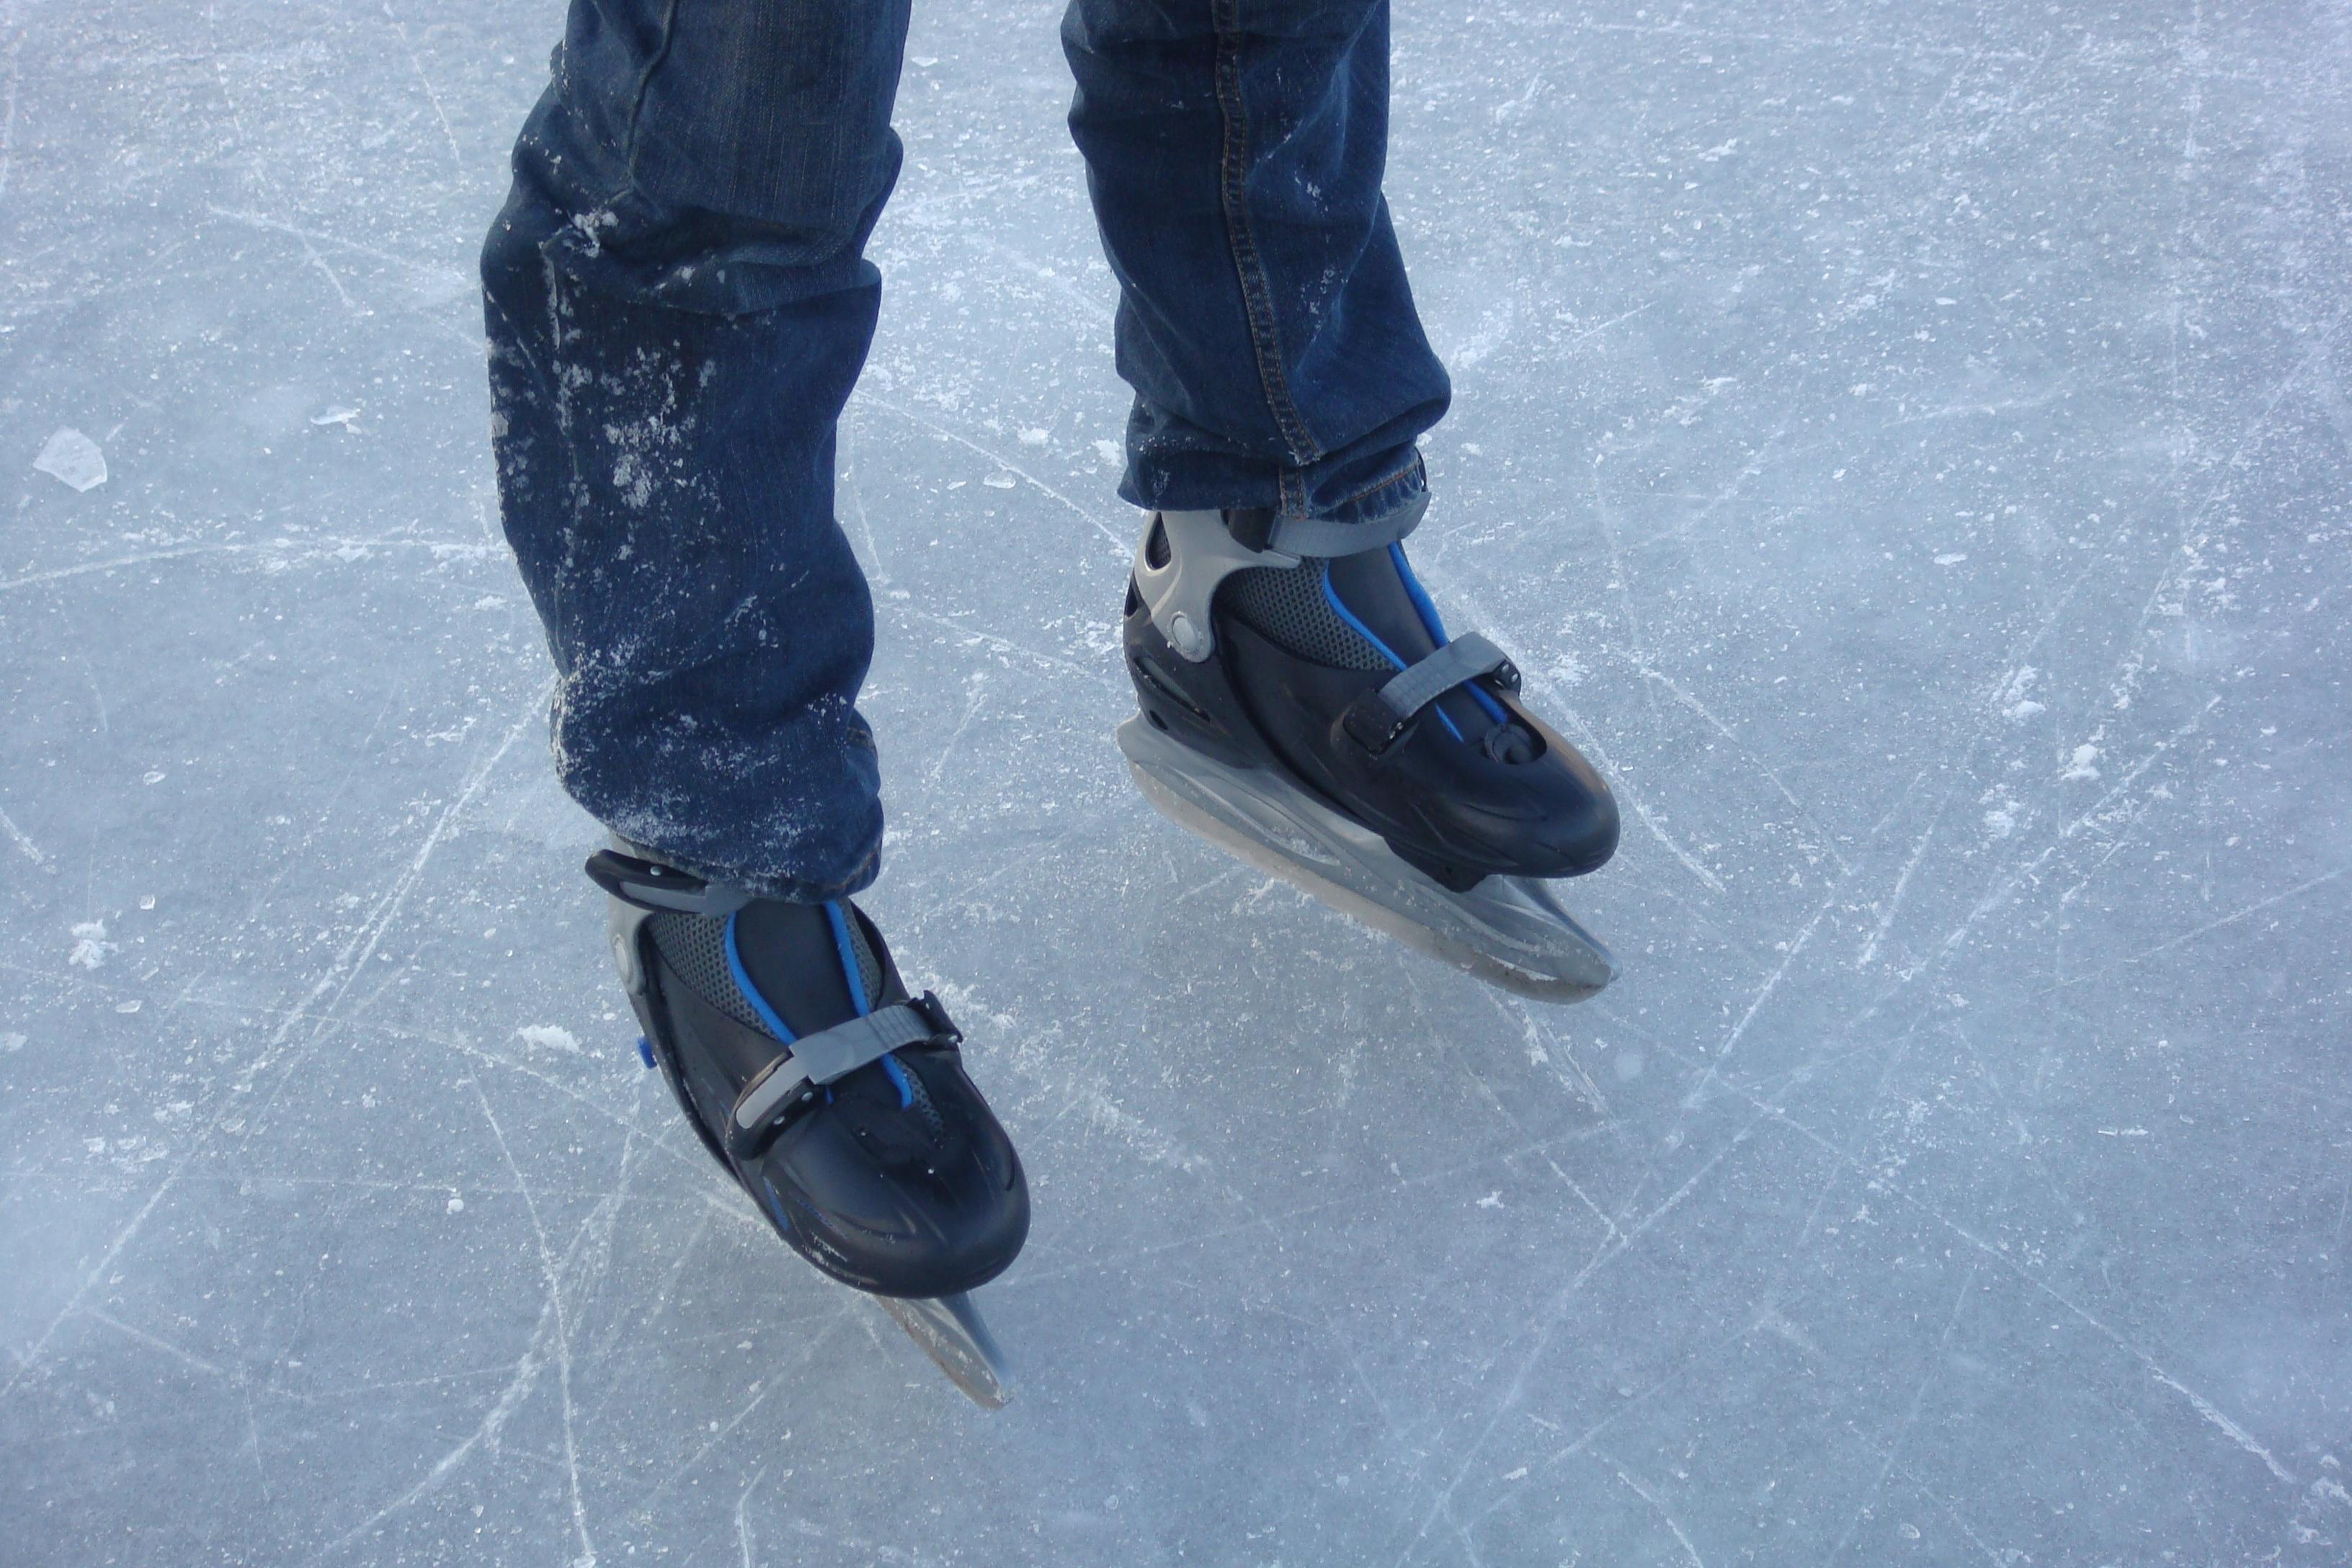 ce76fdf9c3 nieve frío invierno Pies hielo pantalones suave clima raqueta de nieve azul  Snowboard temporada deporte de